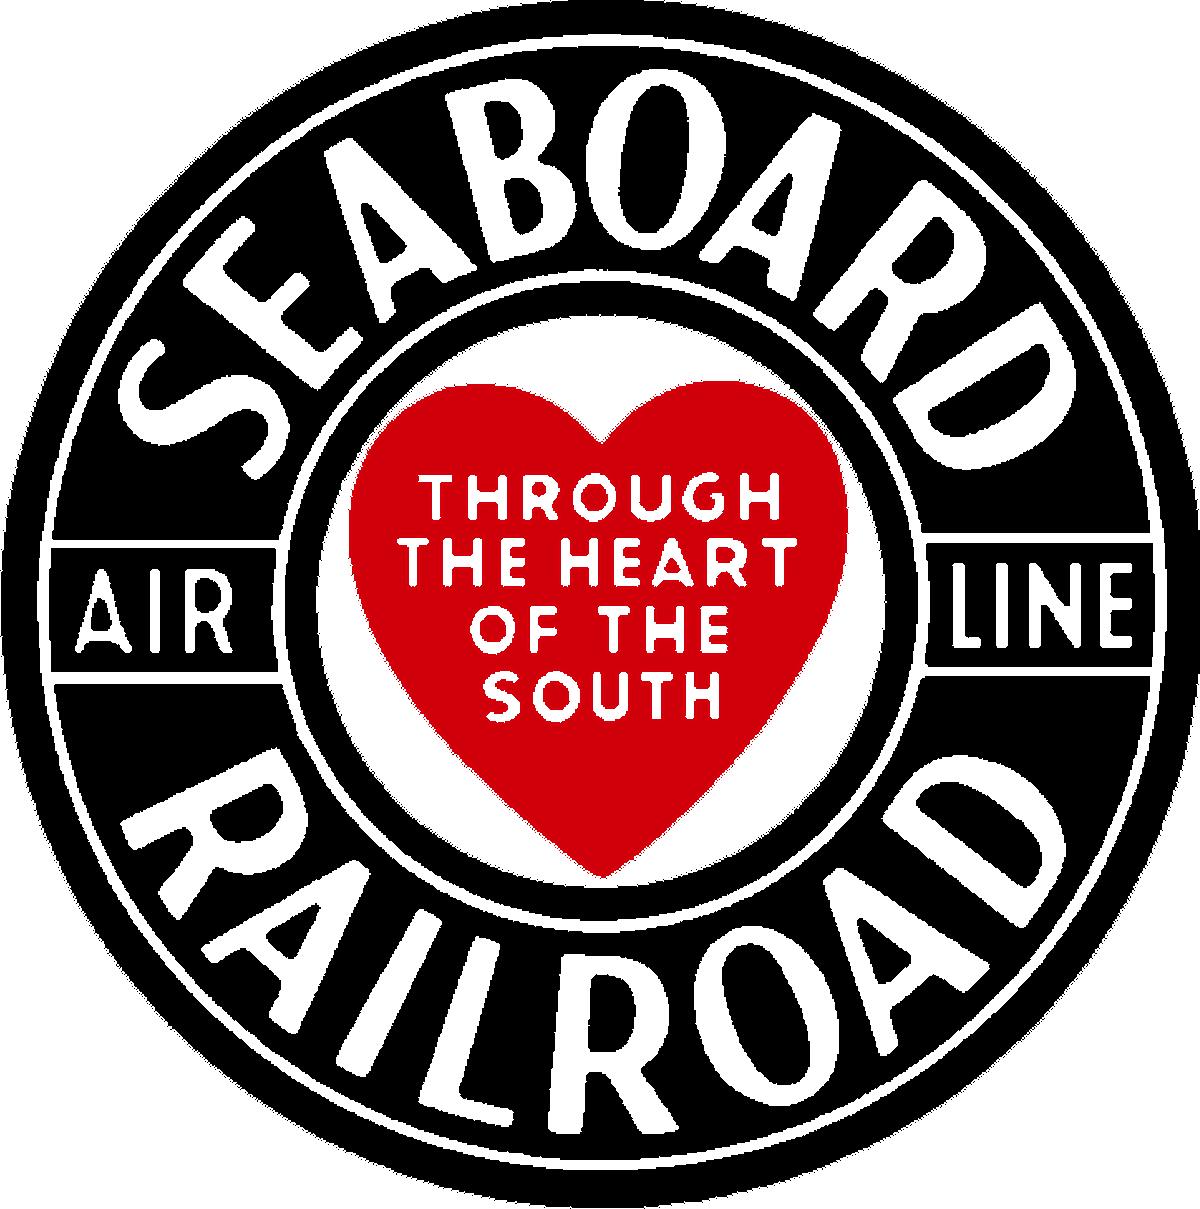 Seaboard Air Line Railroad - a predecessor of CSX. You can click ...